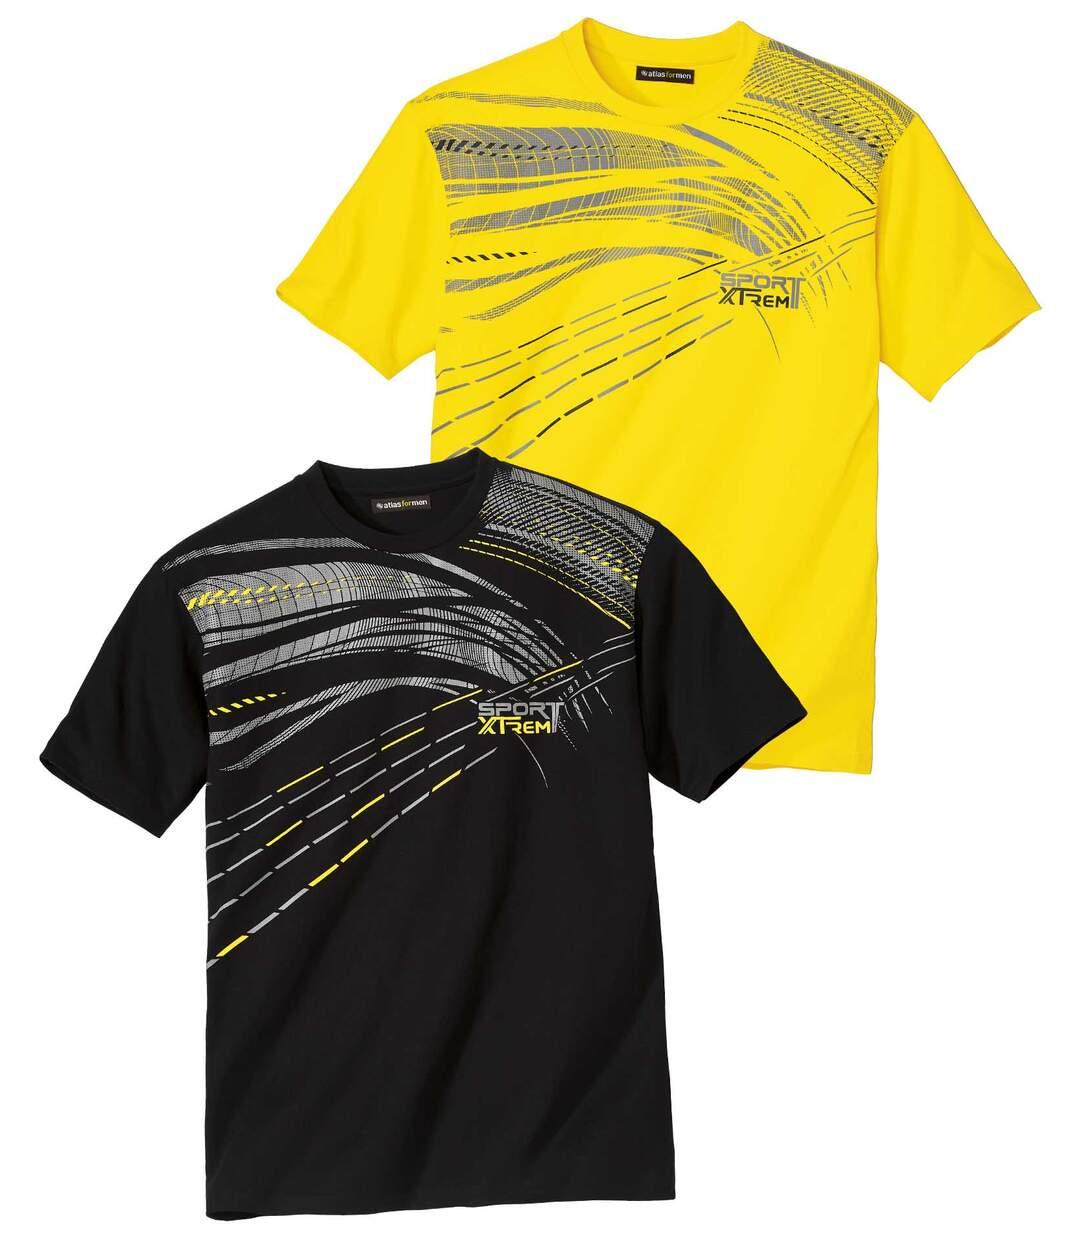 Комплект Футболок «Sport Xtrem» — 2 шт.